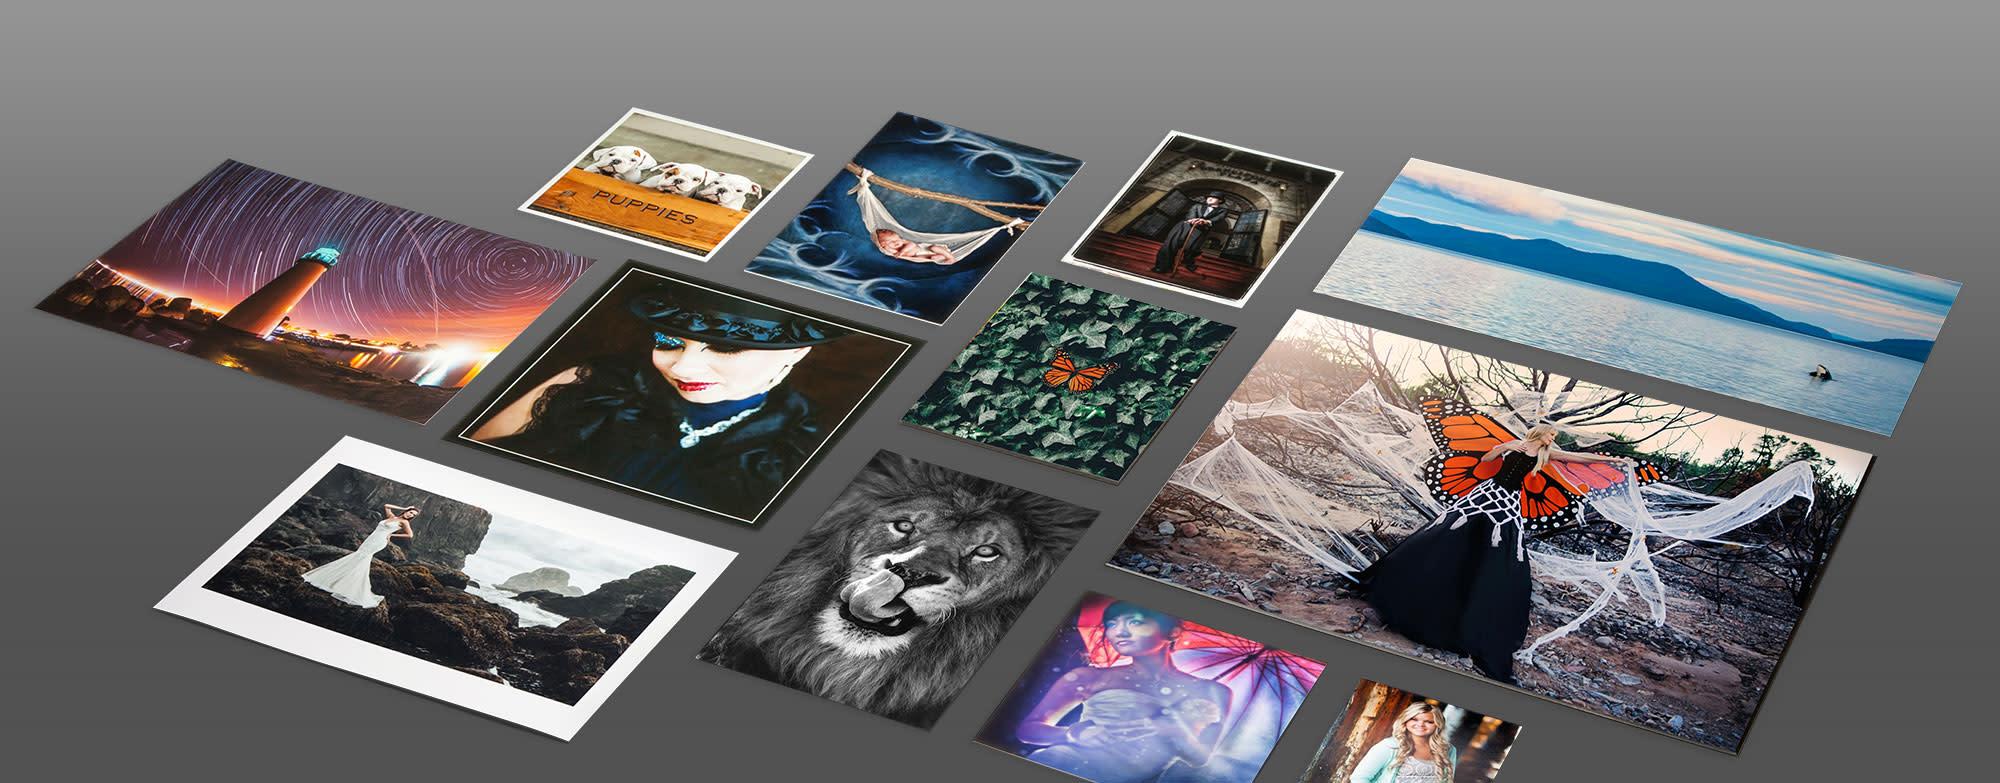 <div class='title'>           slideshow-fineart-prints-u6jchp         </div>